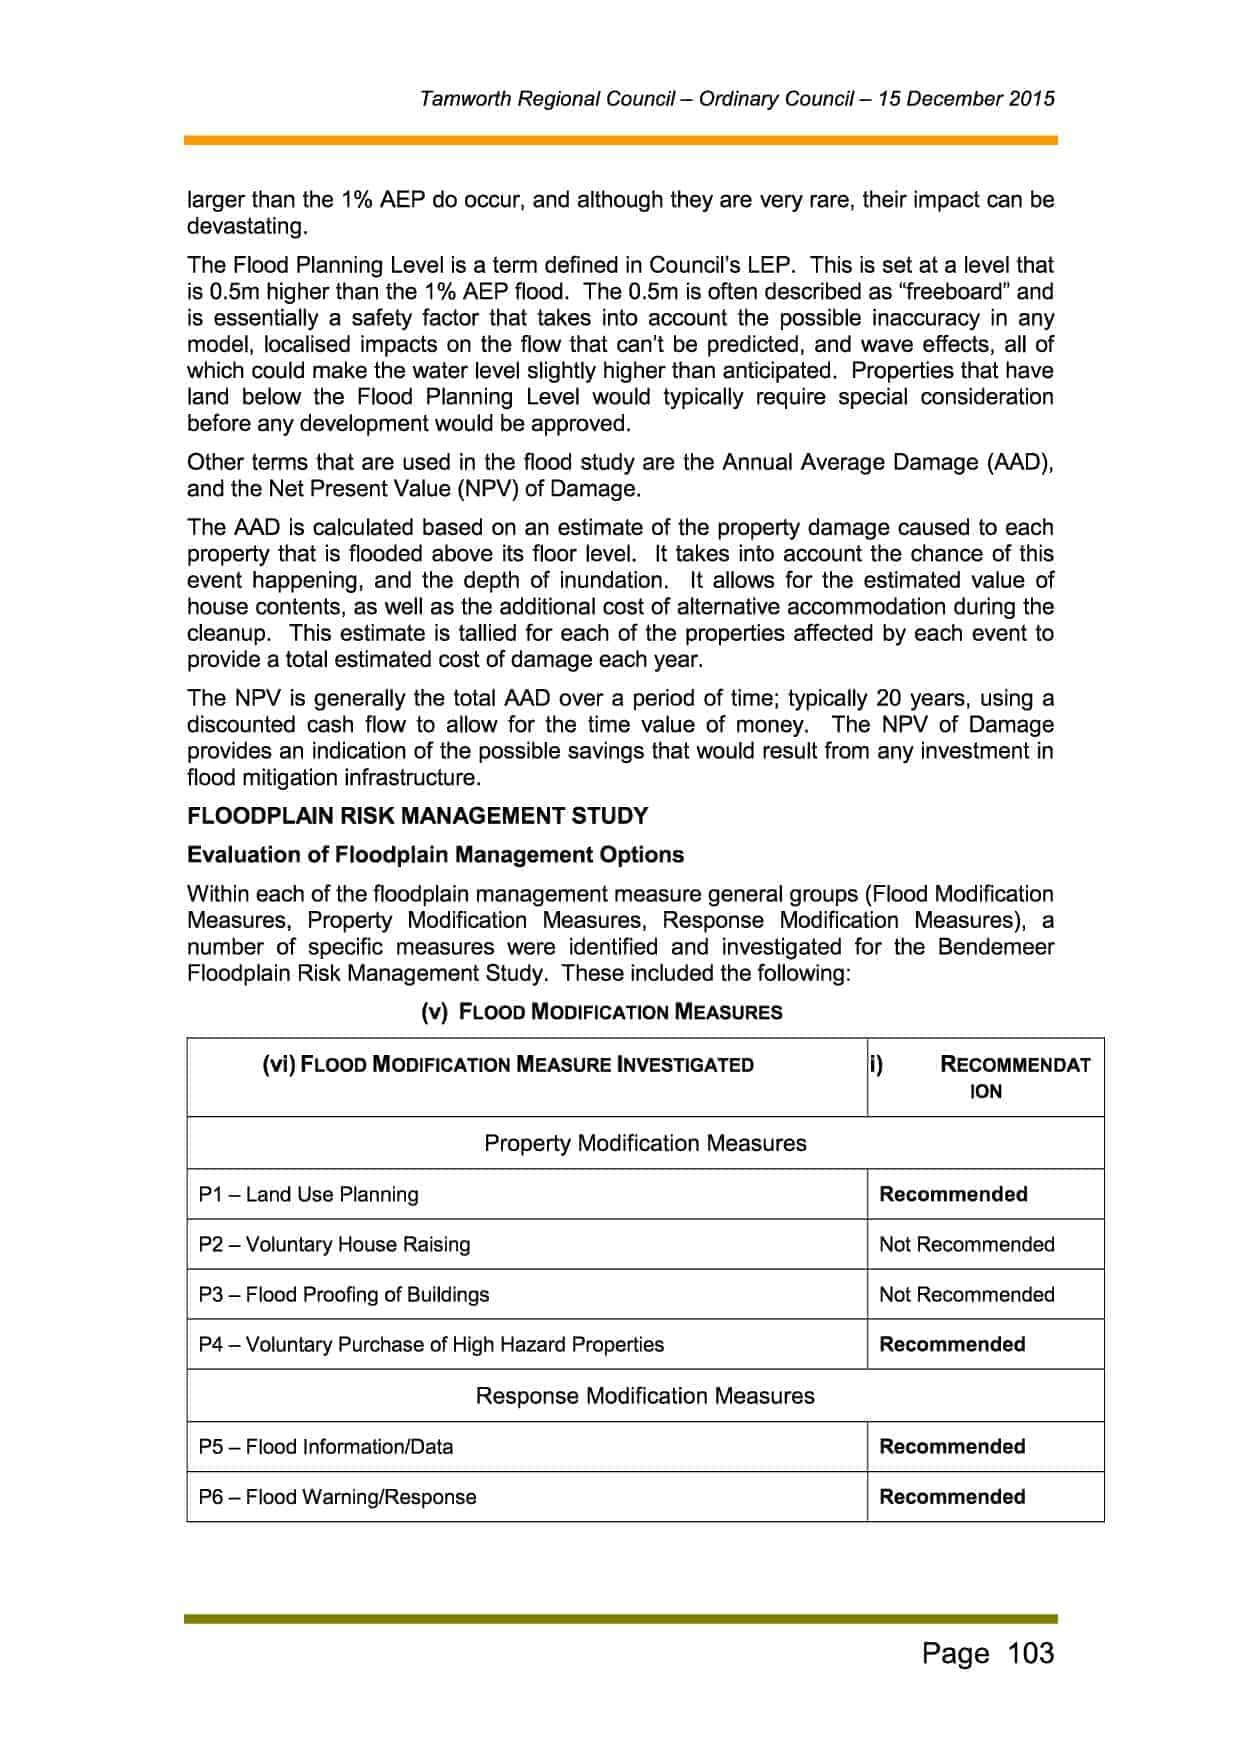 OPEN Business Paper - Ordinary Council 15 December 2015 (1)4